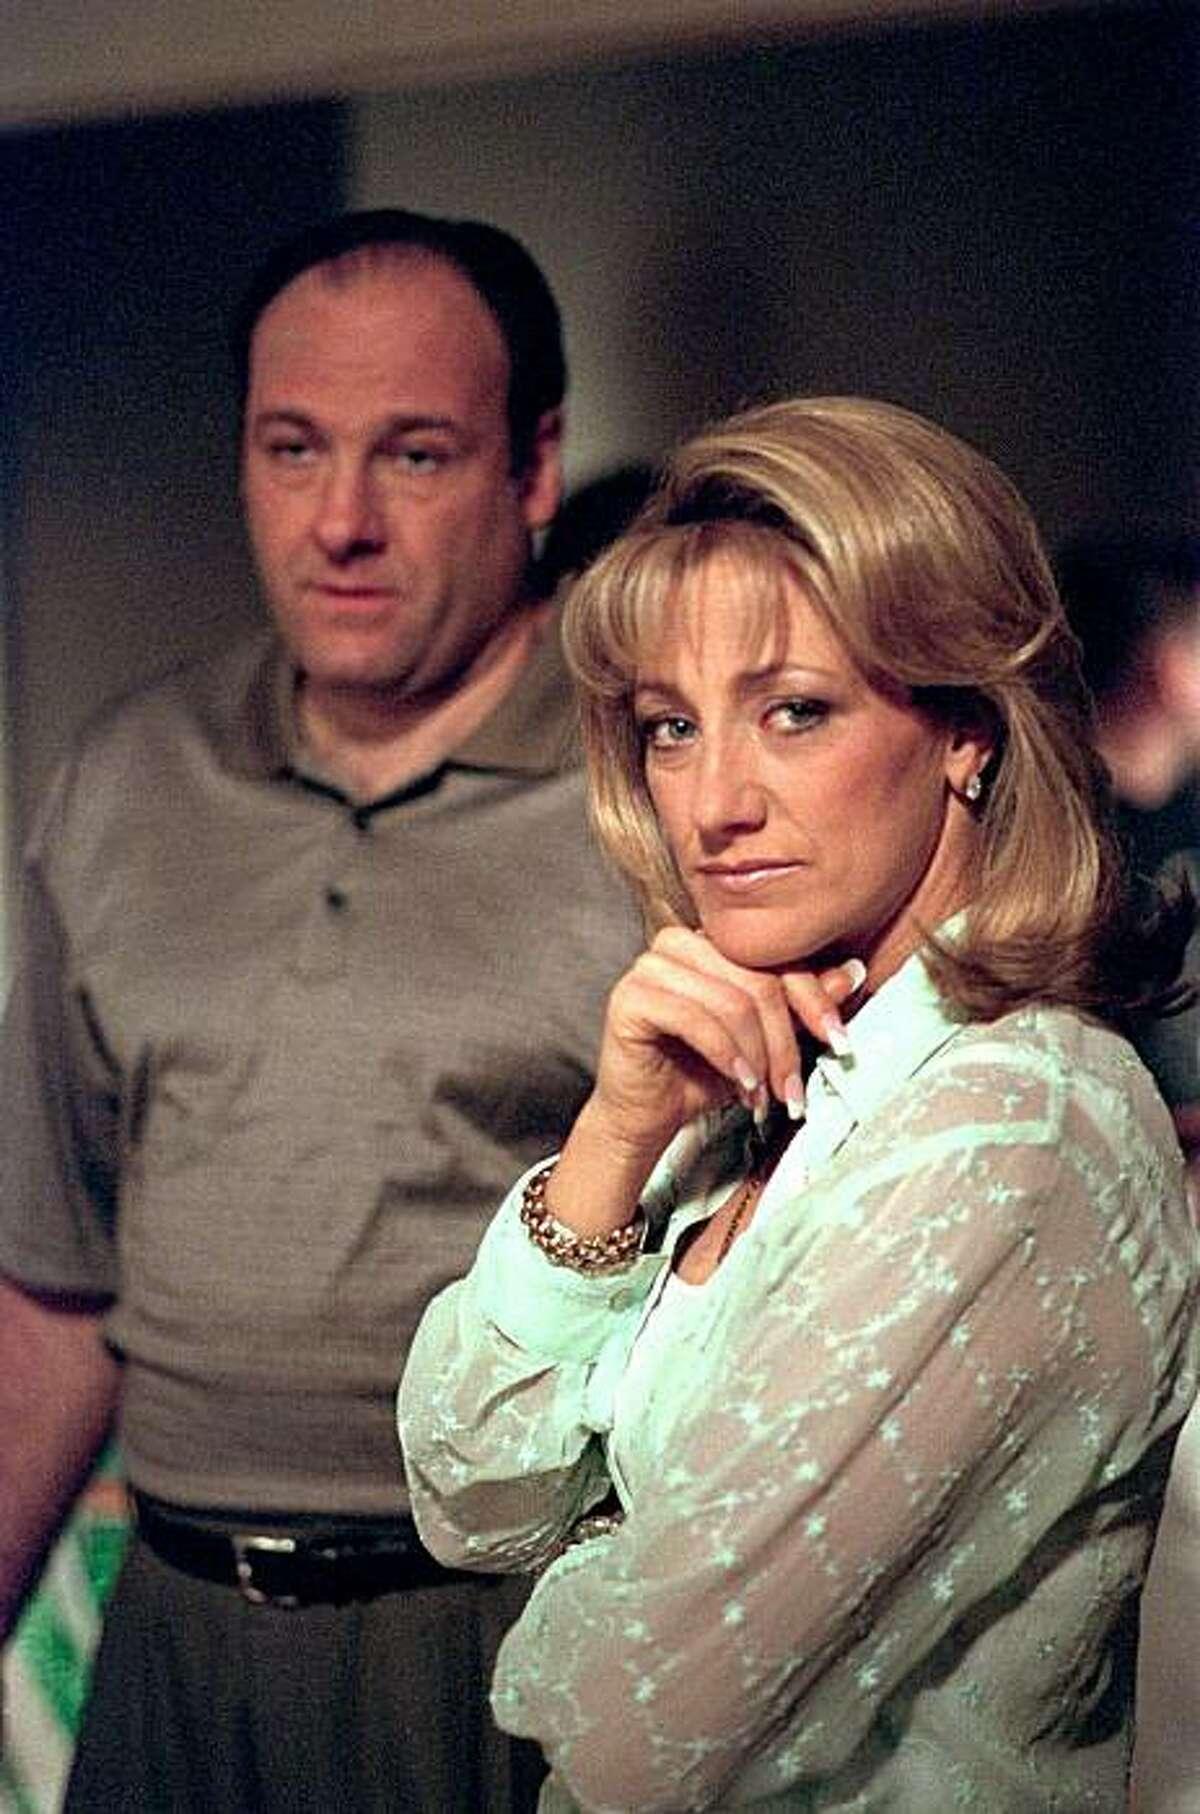 FILE--James Gandolfini and Edie Falco of the HBO drama series